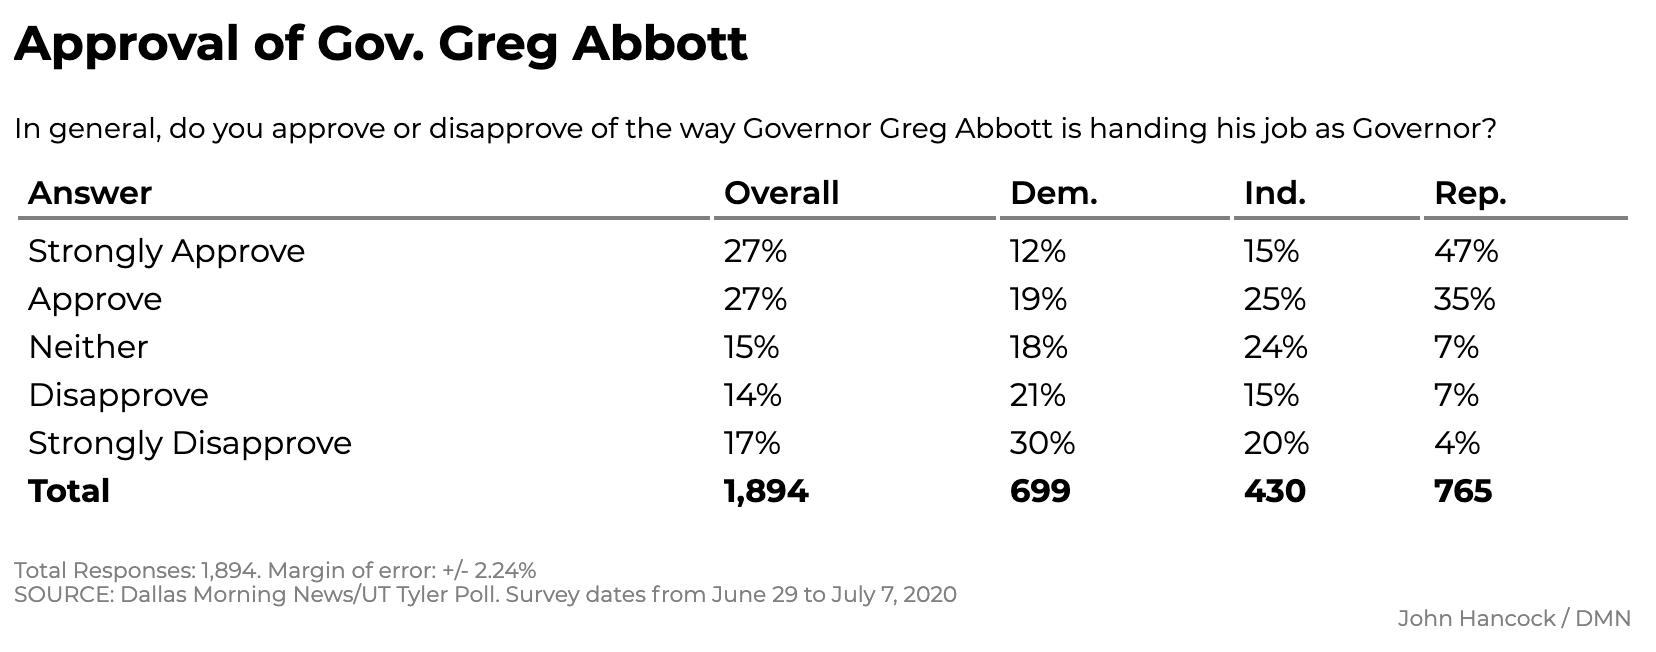 Screen-Shot-2020-07-12-at-12.08.37-PM New Texas Poll Results Show Surprising 5-Point Biden Surge Coronavirus Featured Politics Polls Top Stories